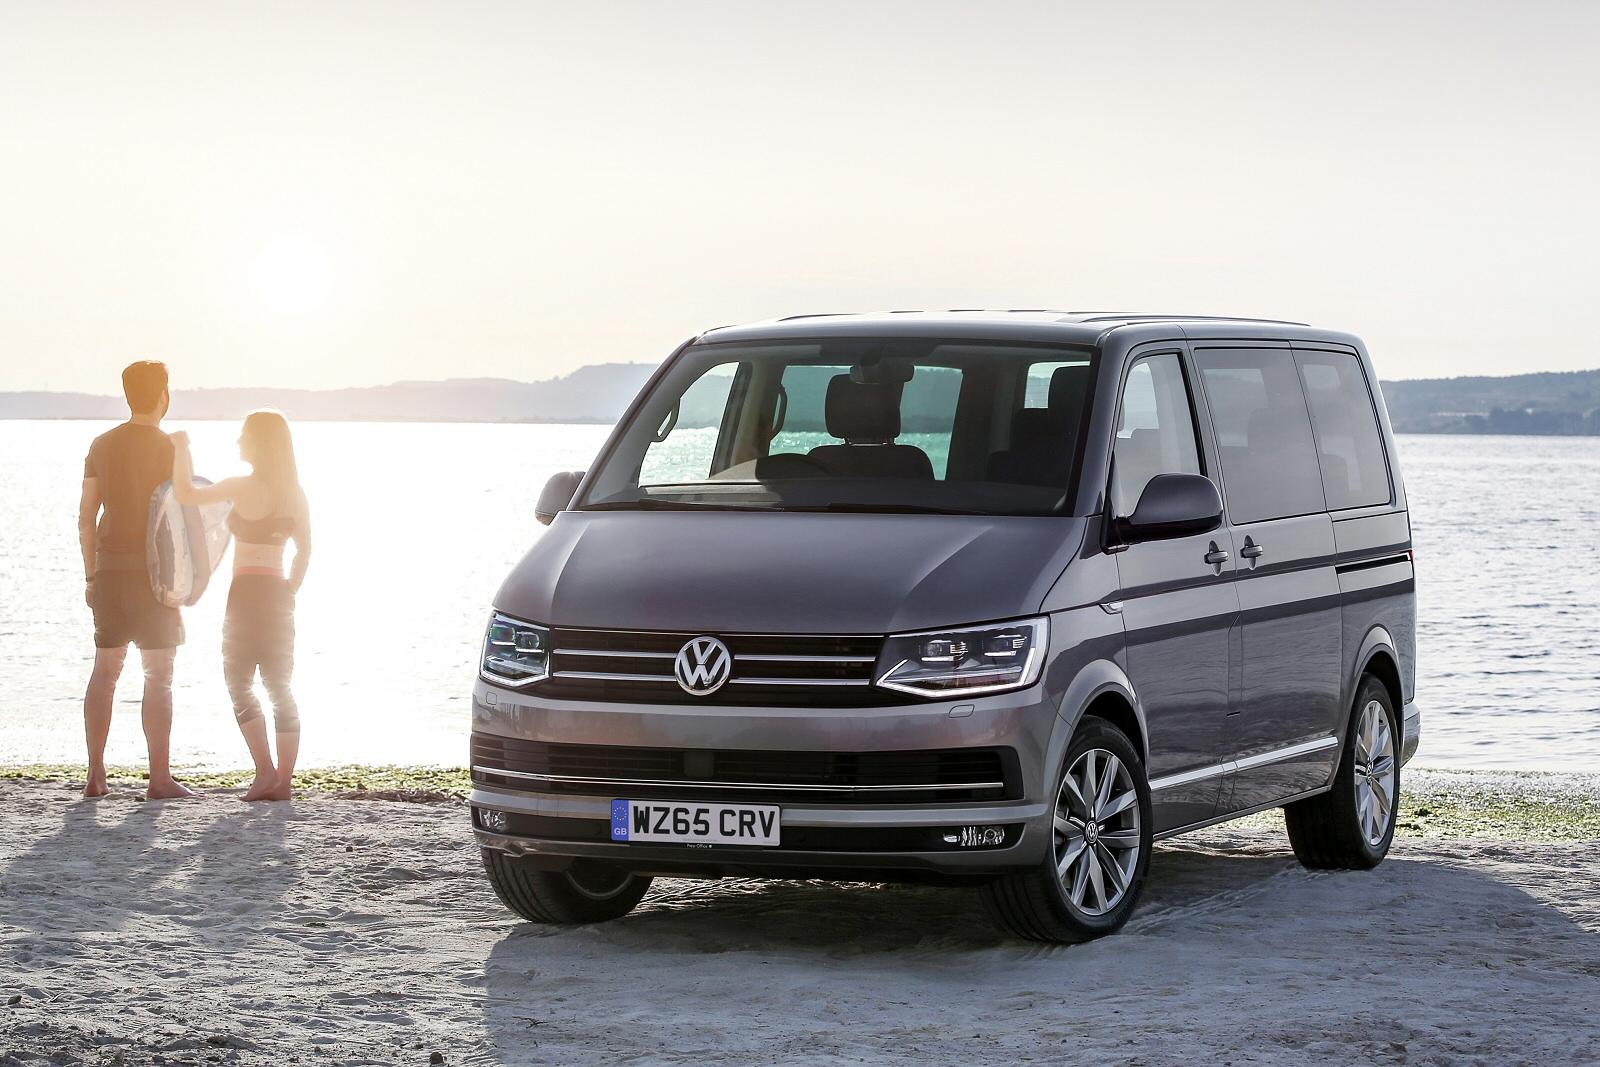 minibus plus volkswagen caravelle range independent new review ref 760 6902. Black Bedroom Furniture Sets. Home Design Ideas